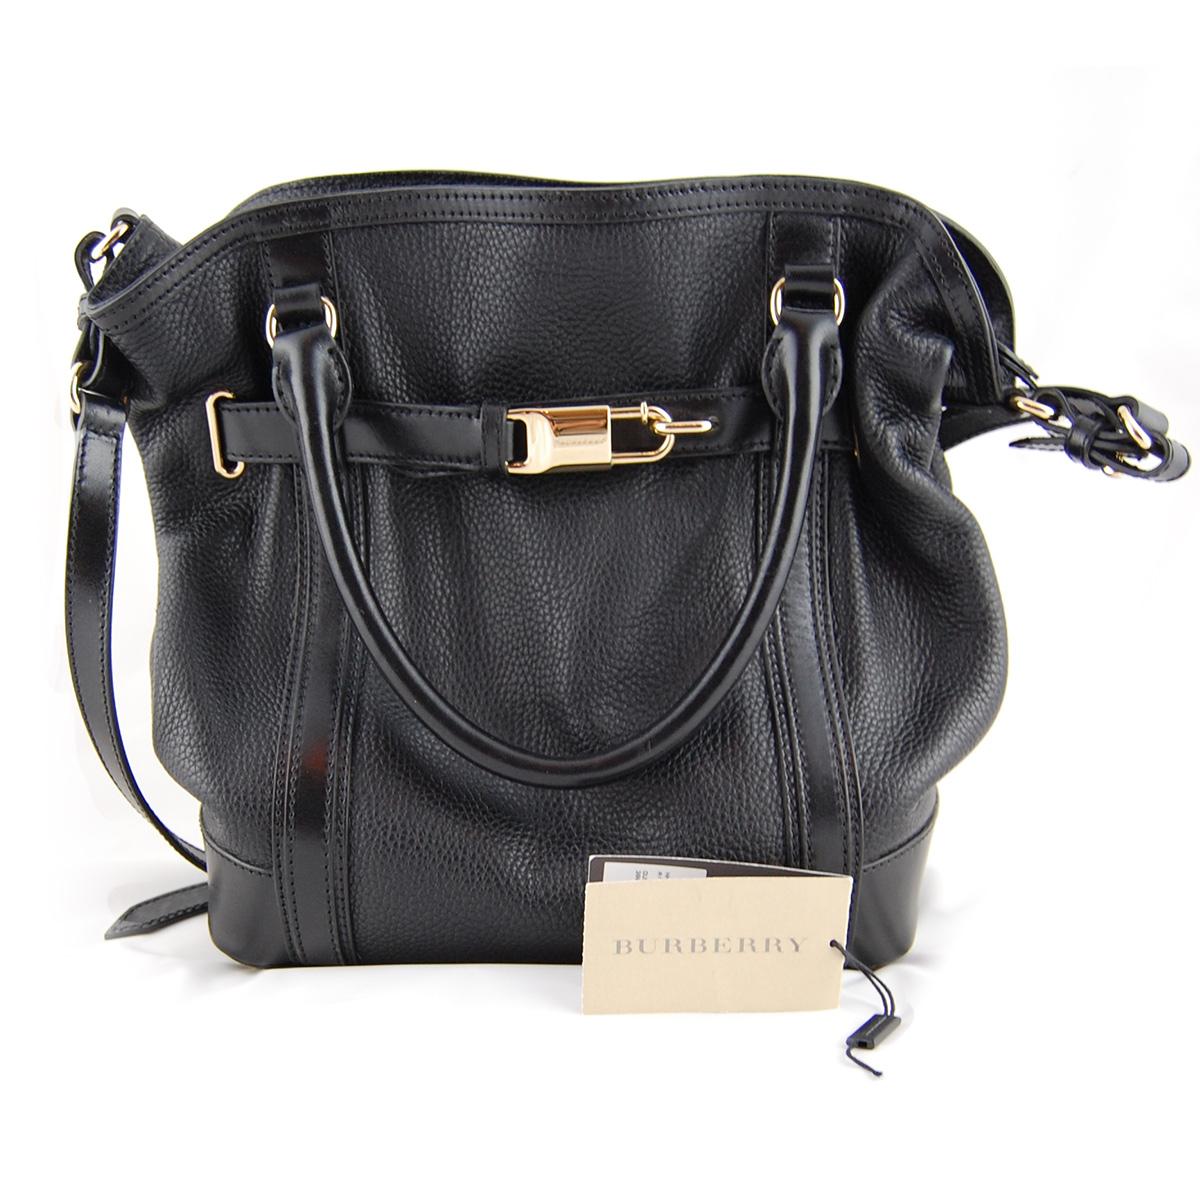 2a53b678ac32 Handbag Collective